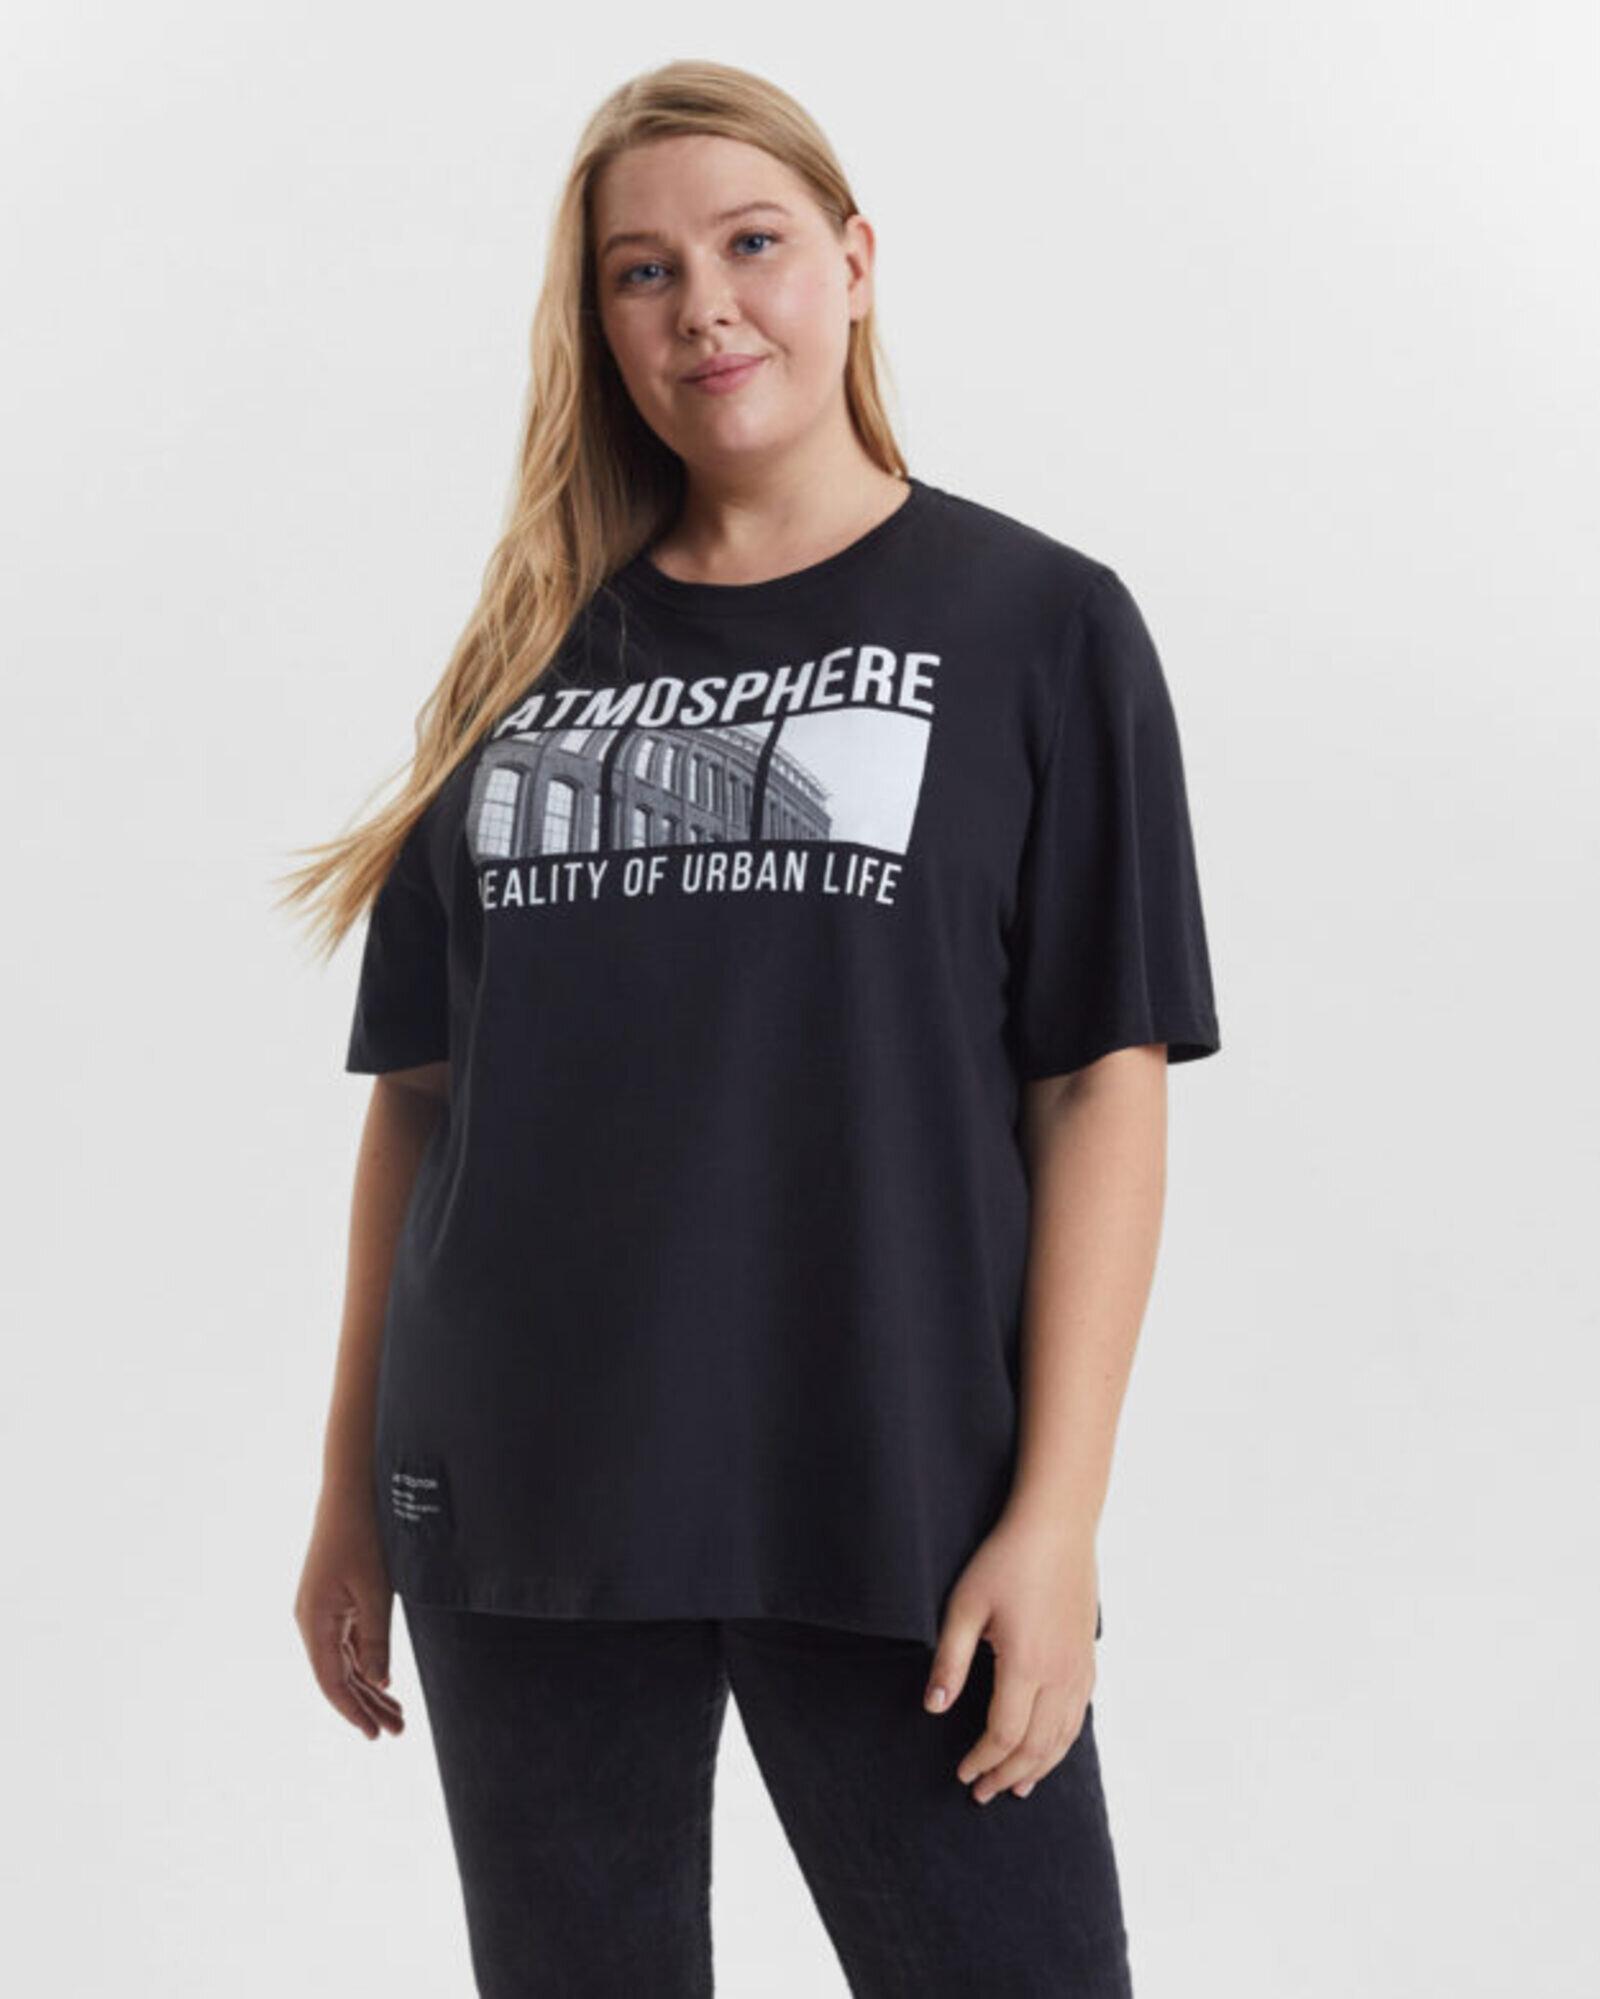 Футболка женская «Atmosphere» черная Plus size